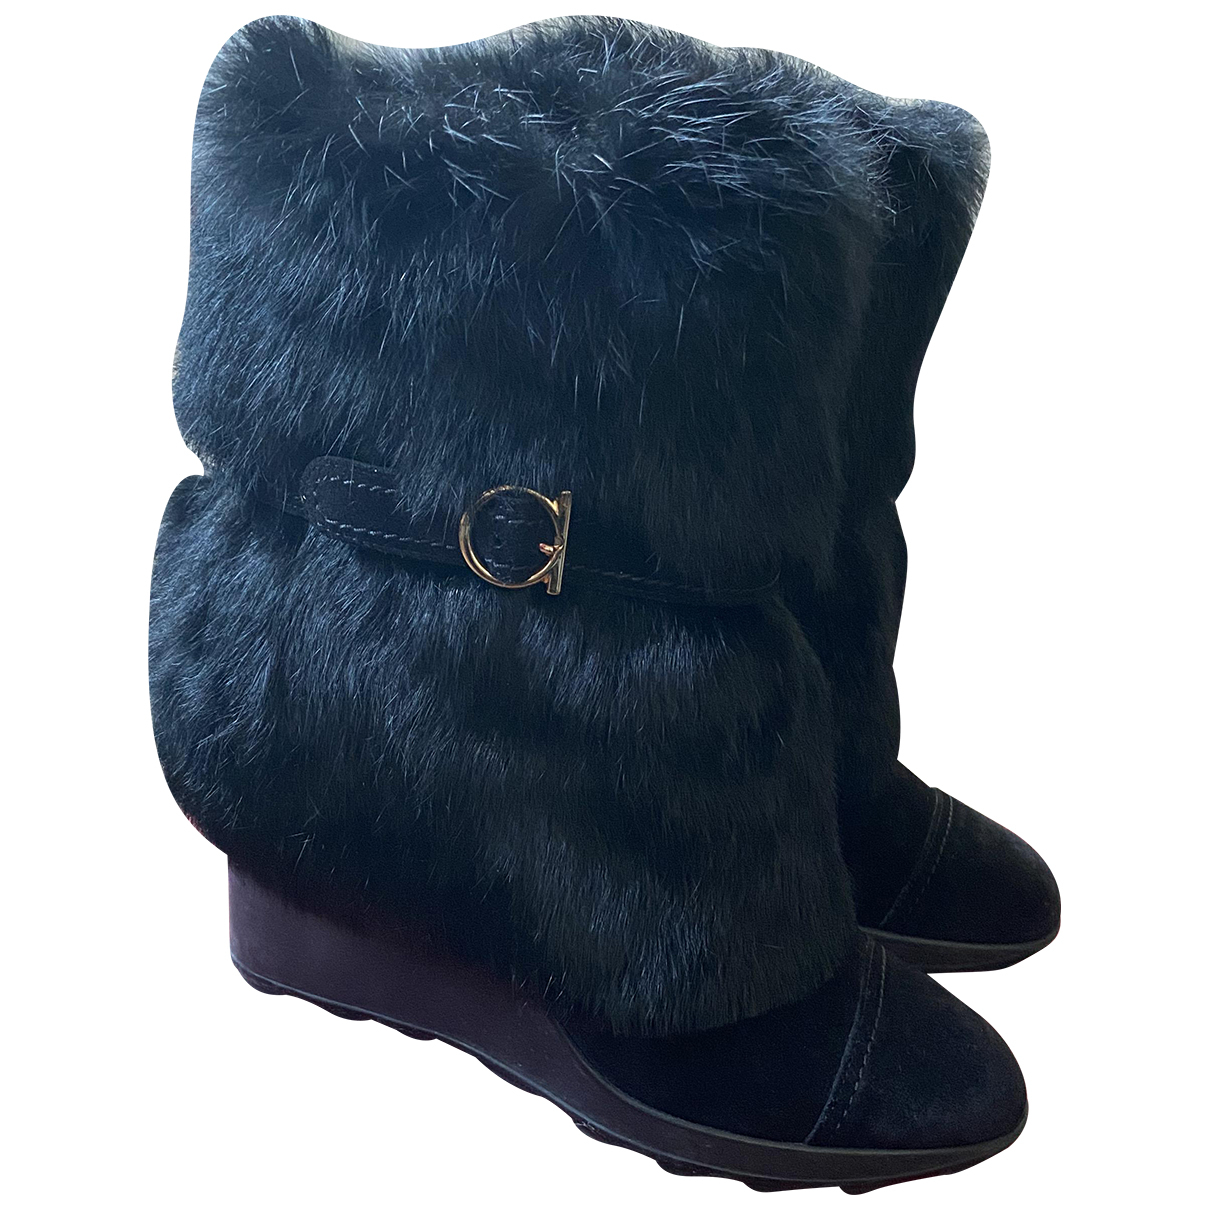 Salvatore Ferragamo N Black Rabbit Boots for Women 36.5 EU